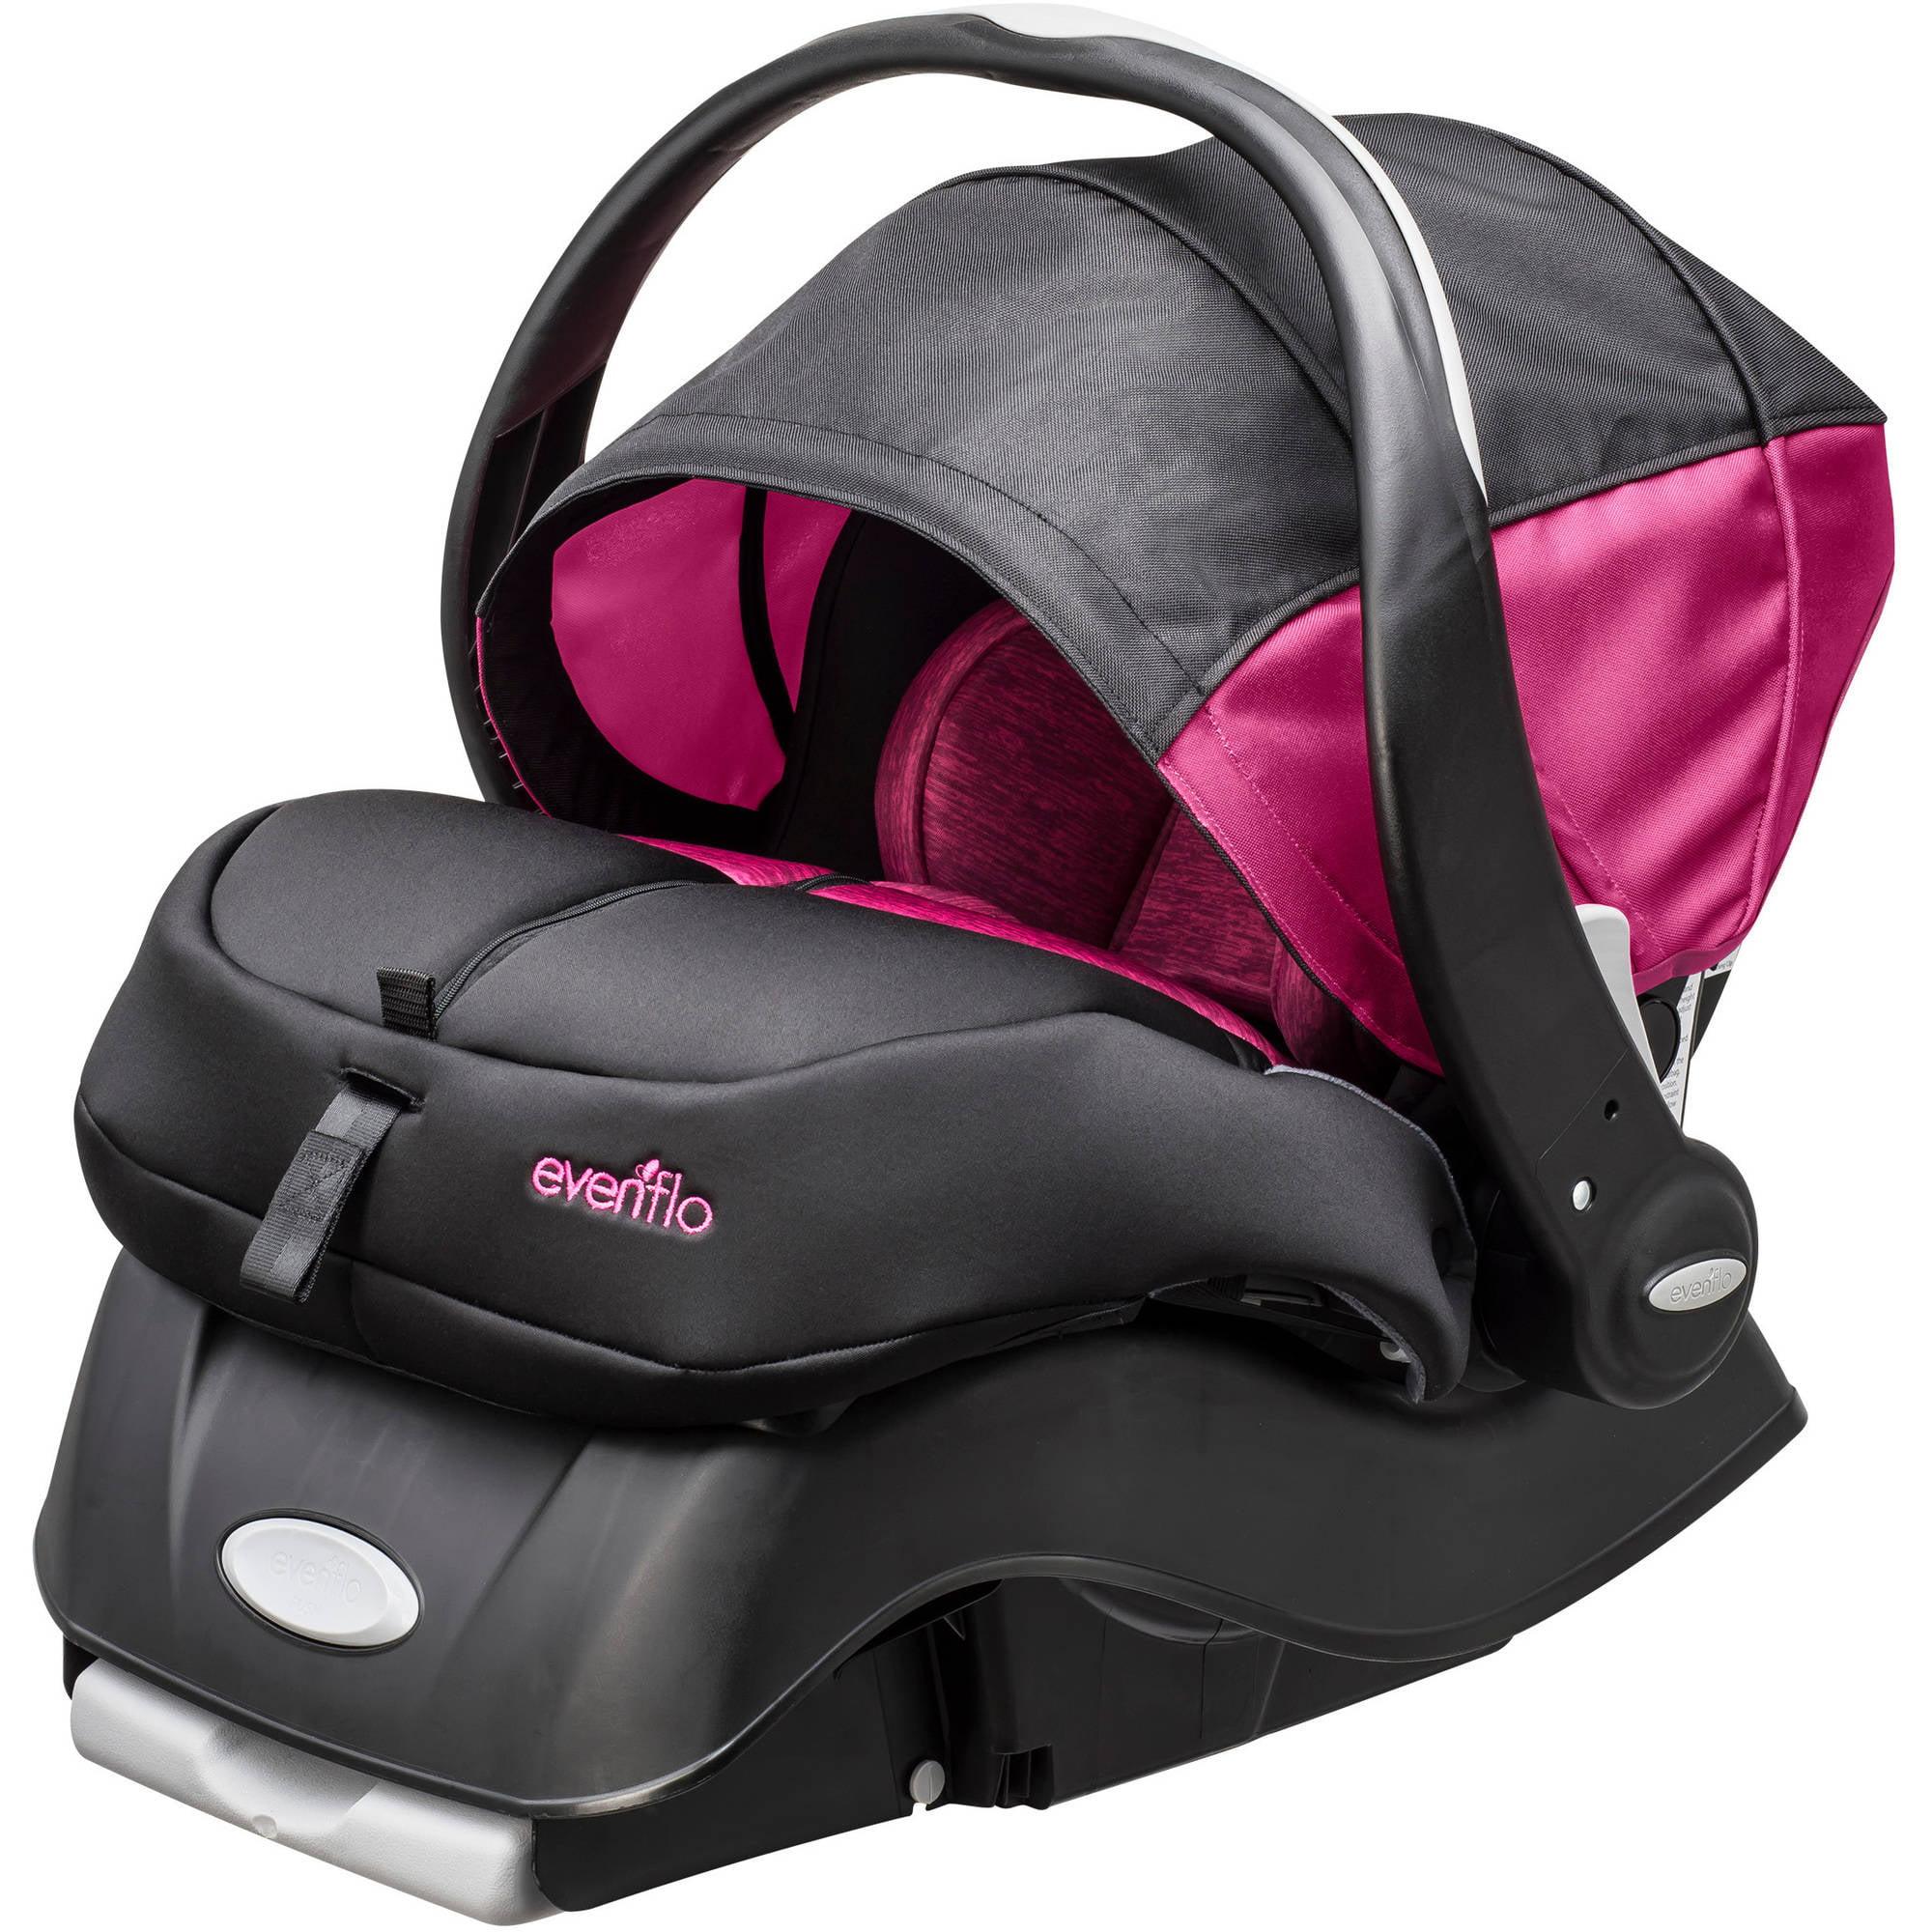 Evenflo advanced embrace dlx infant car seat with sensorsafe choose your pattern walmart com